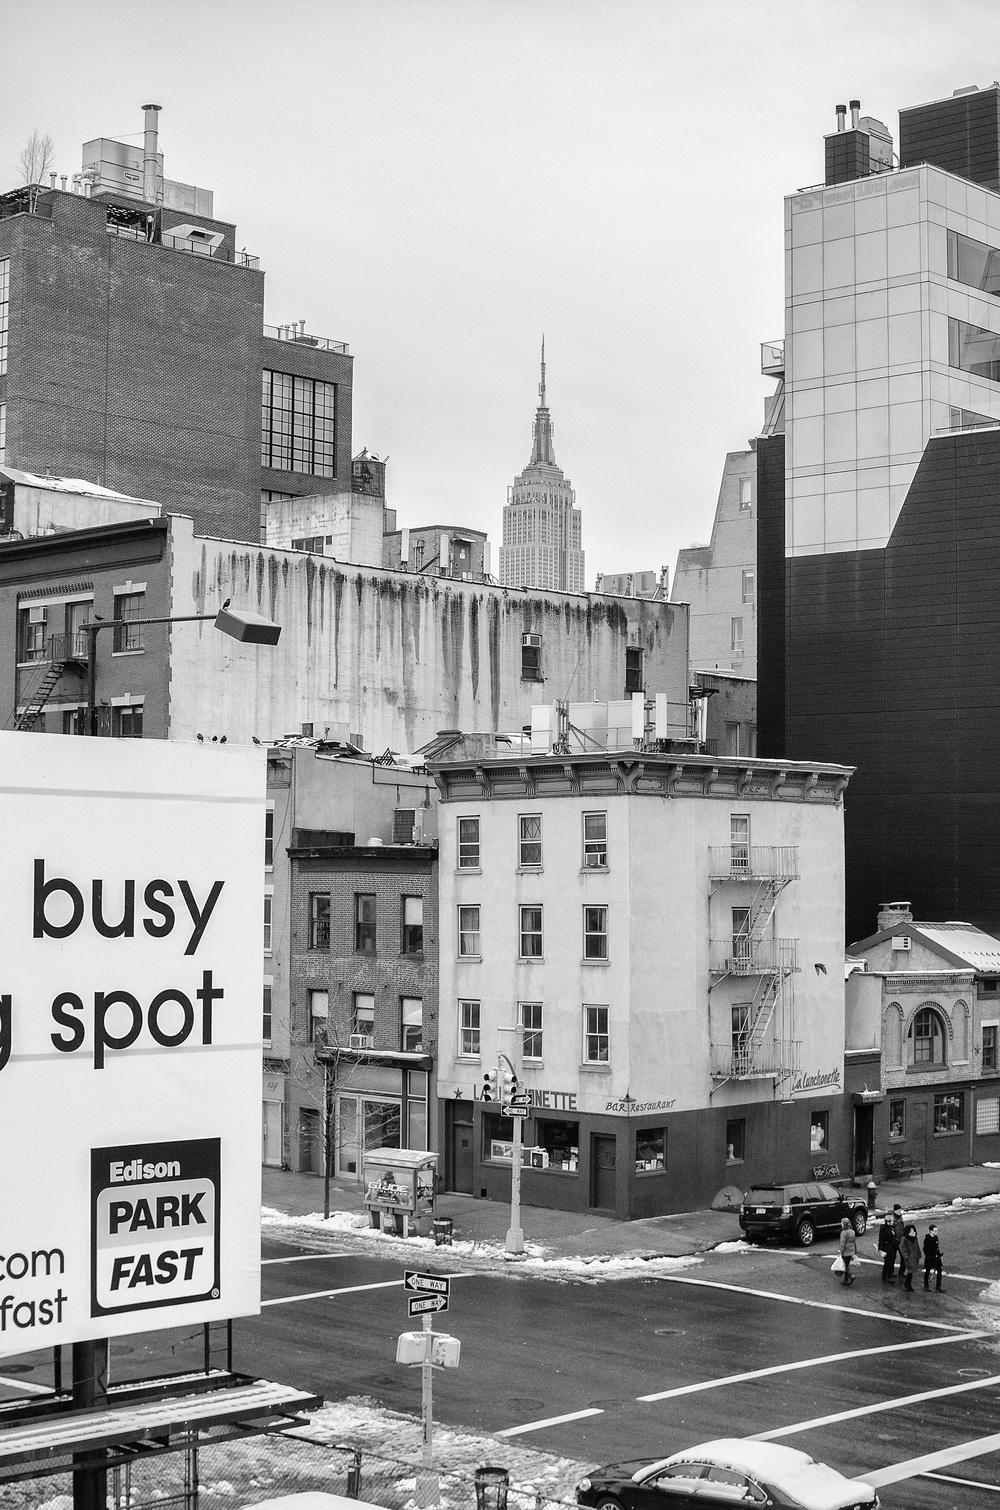 Busy Spot - New York City, USA March 2013